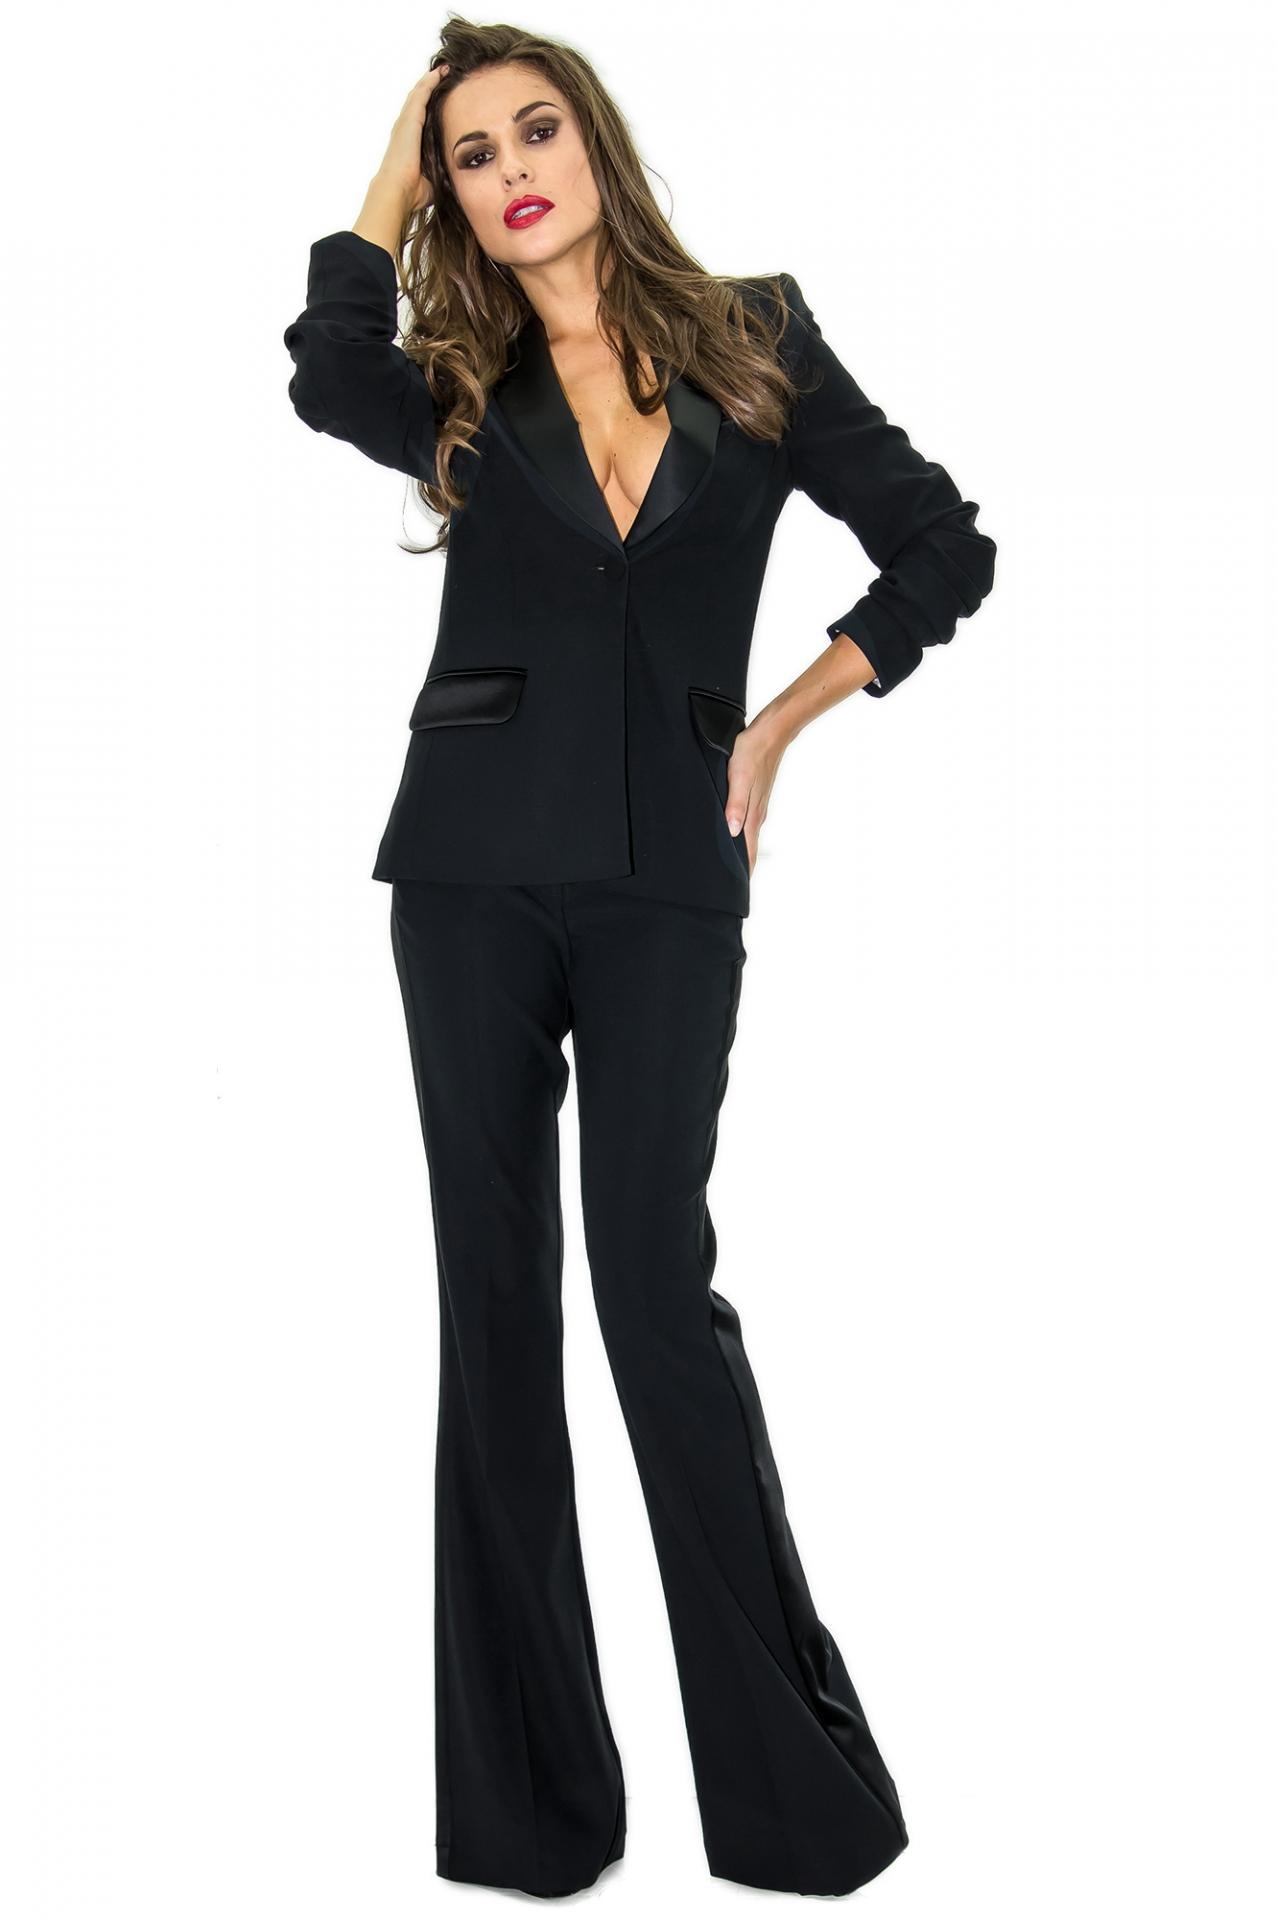 pantalon de smoking femme pantalon habill stefanie renoma stefanie renoma. Black Bedroom Furniture Sets. Home Design Ideas